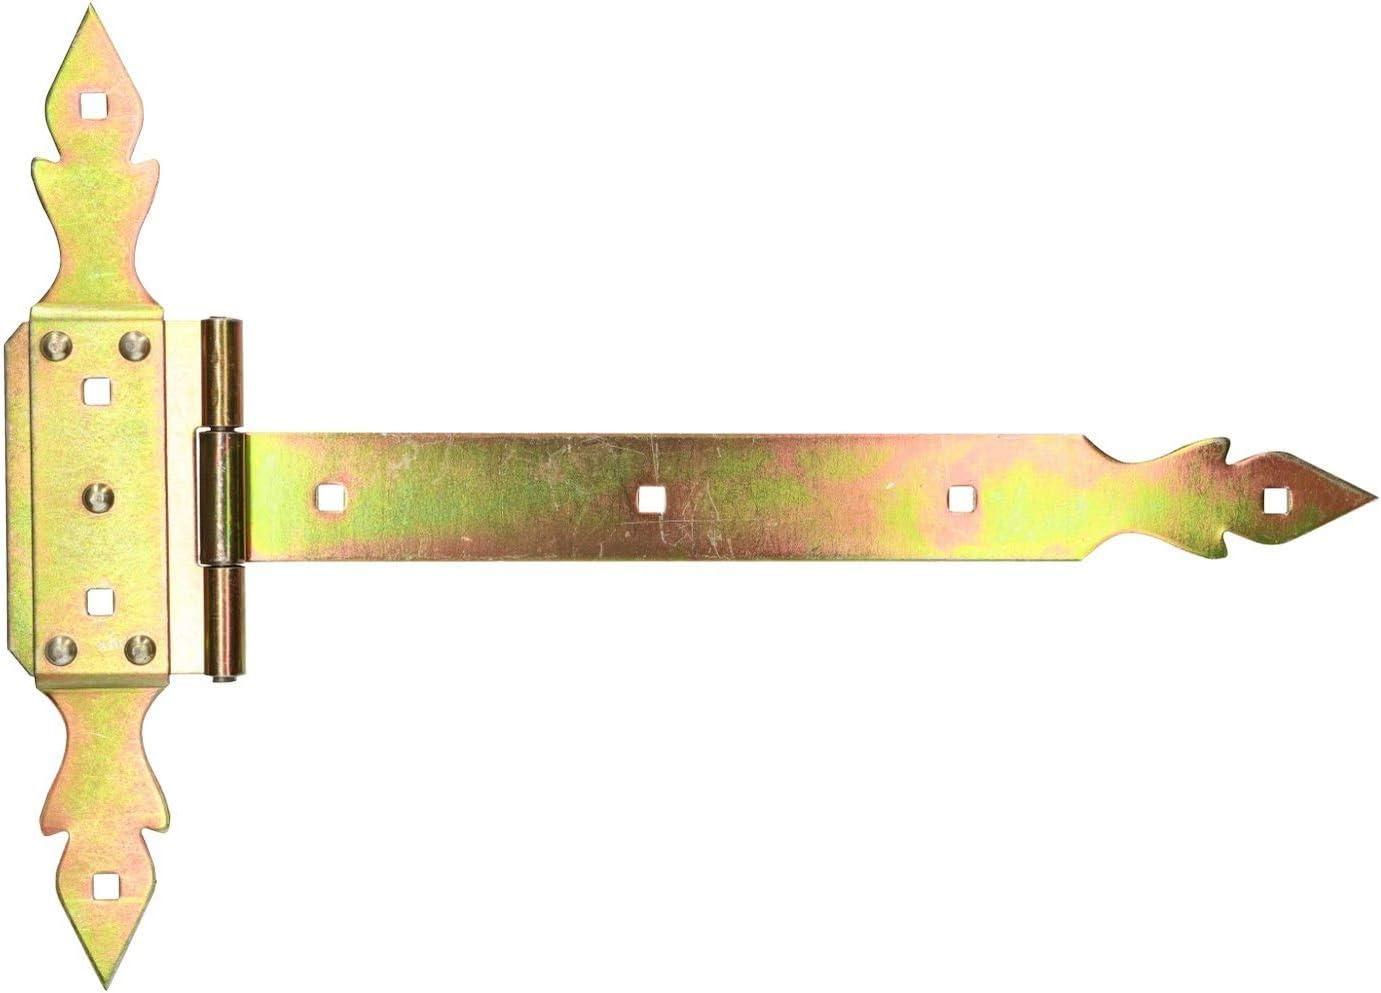 KOTARBAU Kreuzgehänge 250 mm Ladenband Scharnier Band Platte Baubeschlag T-Band